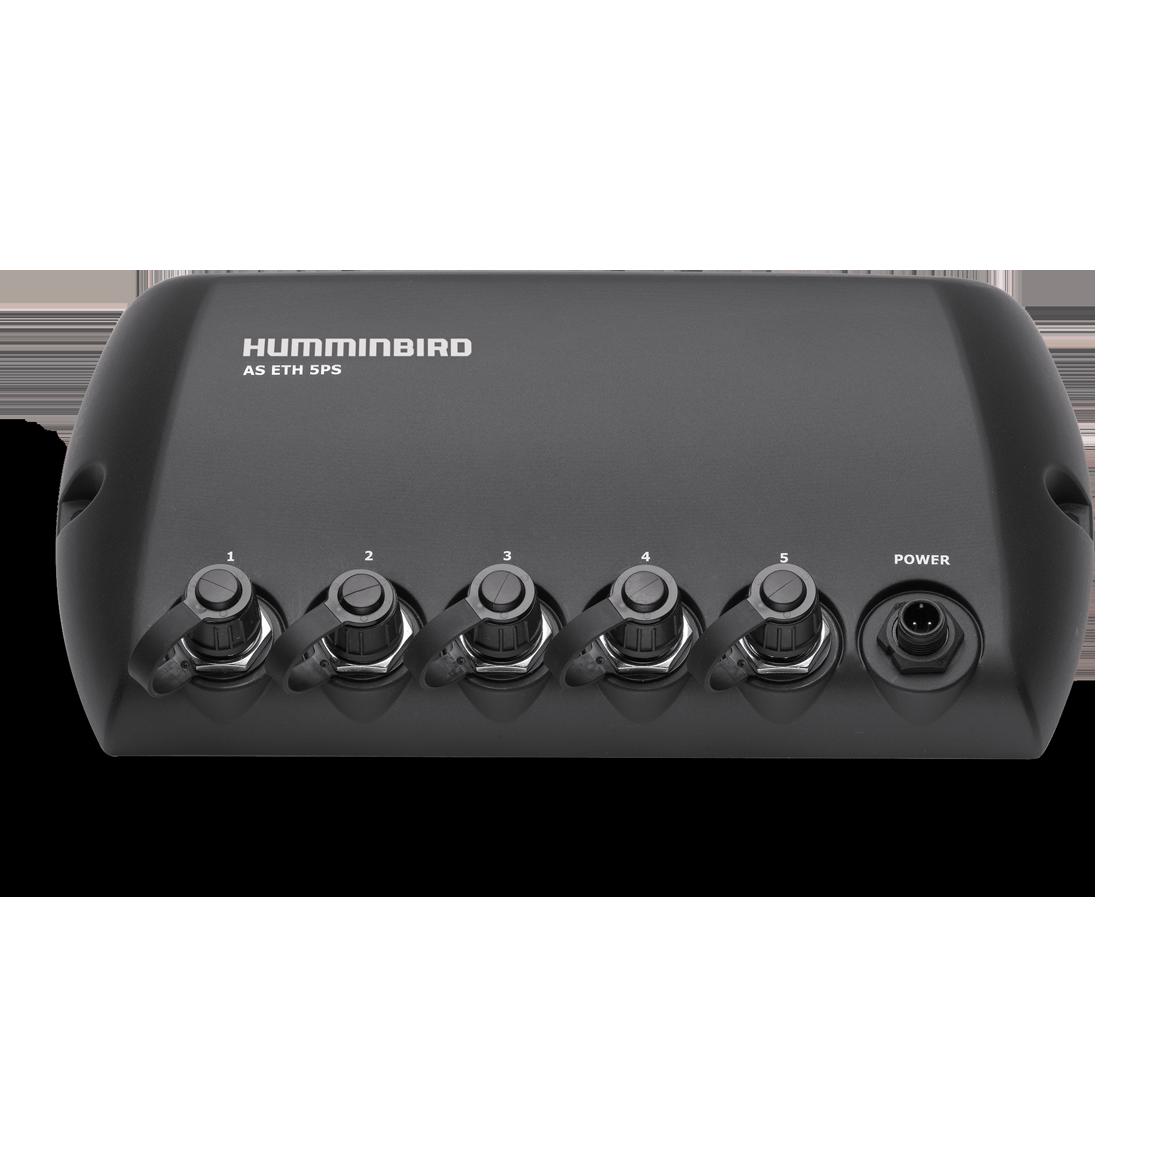 Humminbird Ethernet Hub Humminbird Ethernet Hub Bass Boat